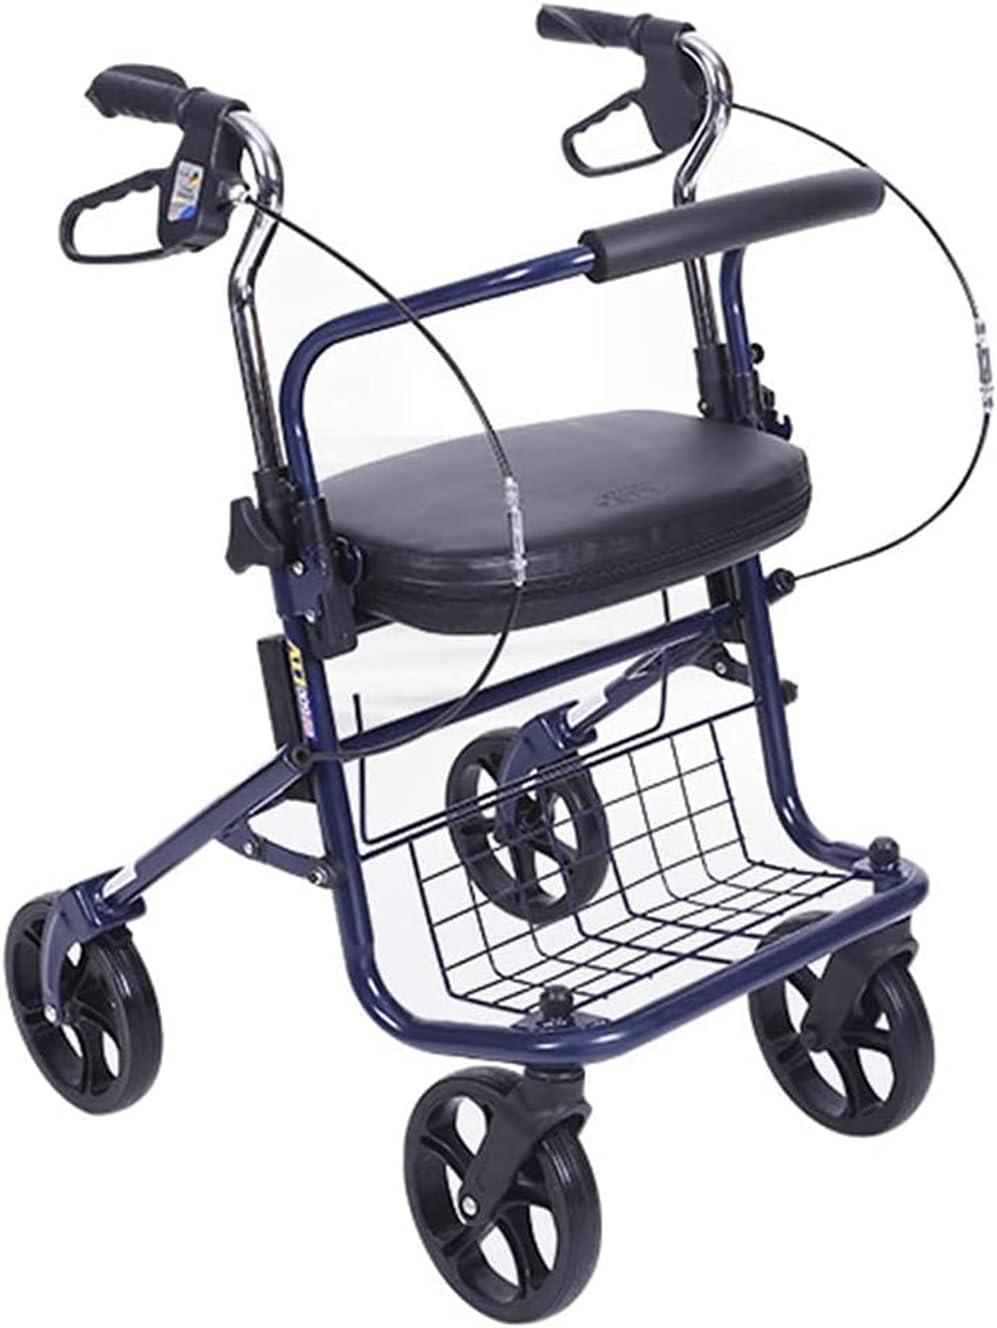 DONGSHUAI All items in the store Walking Frame Lightweight Steel Car Rollator Wheels 4 Elegant